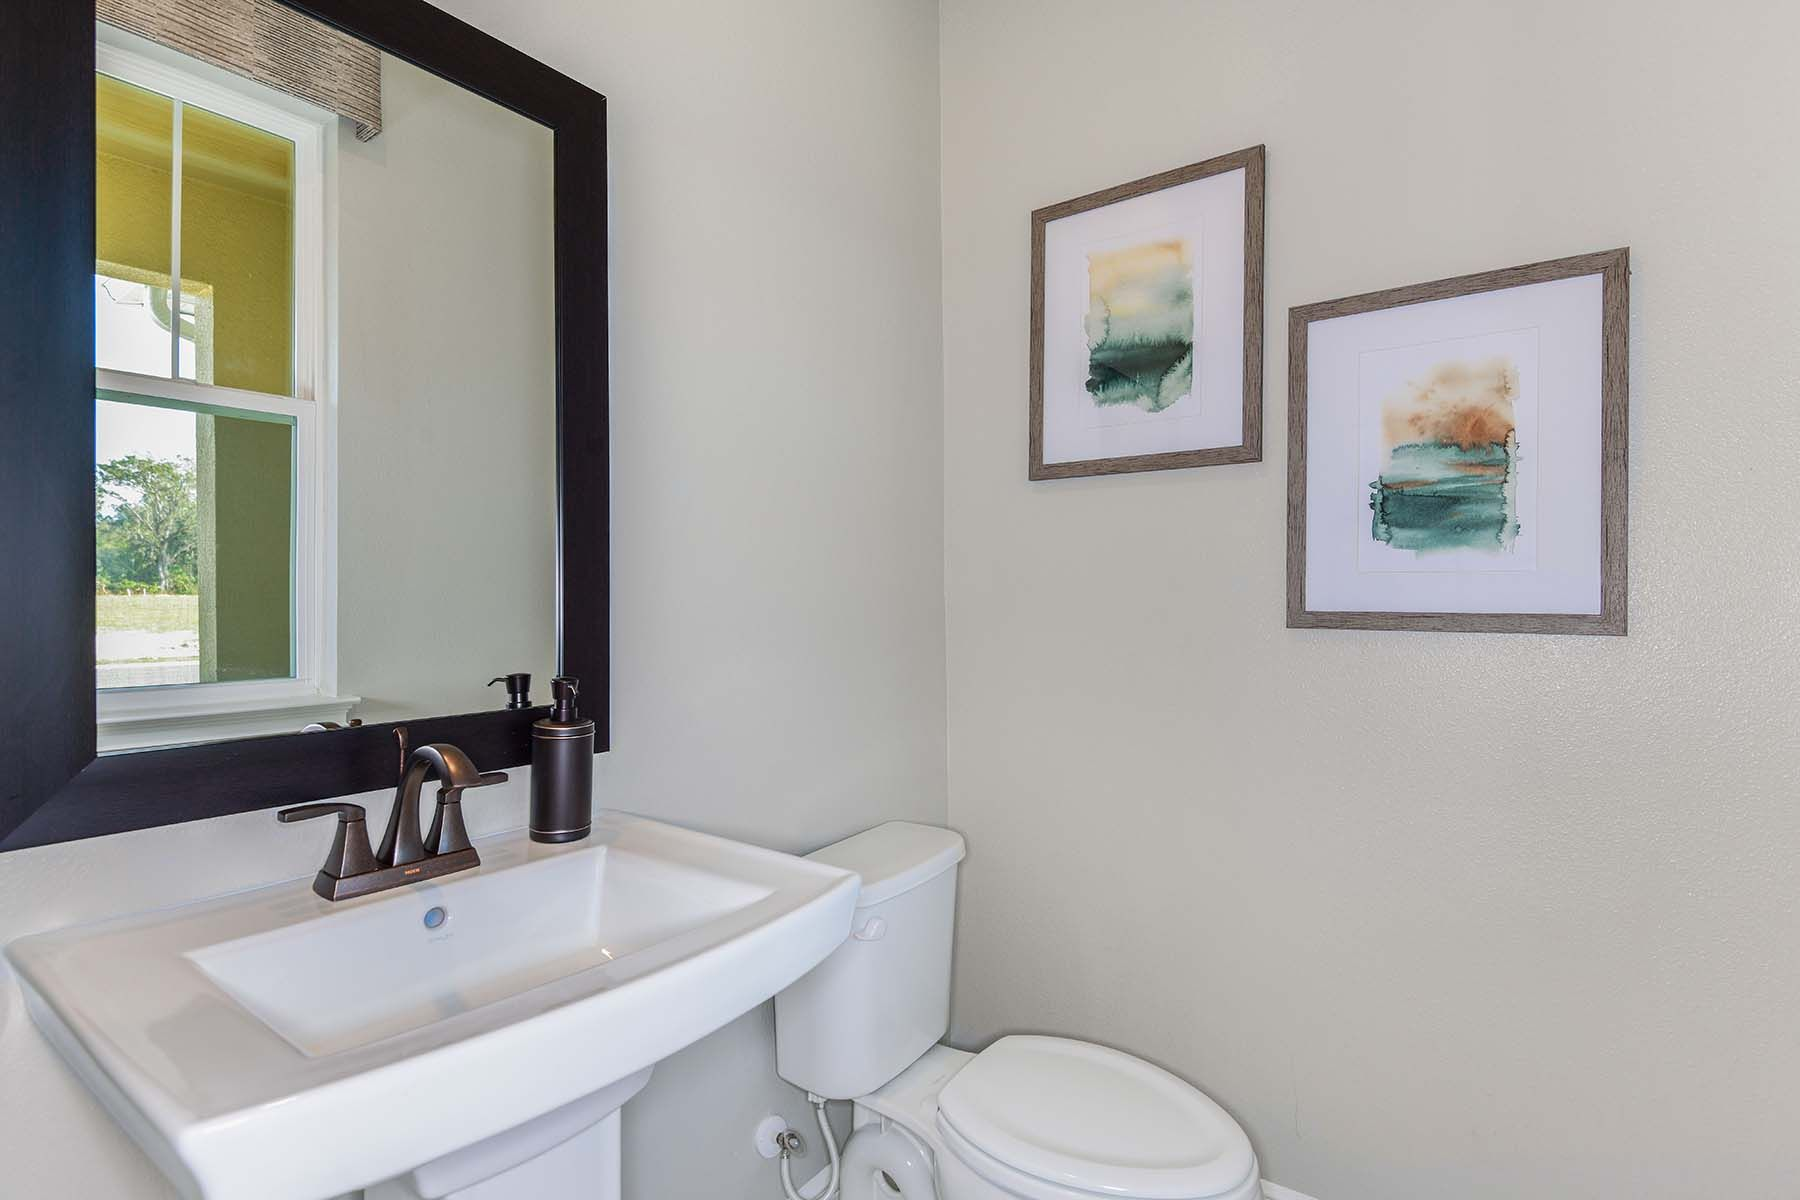 Bathroom featured in the Sandbar By Mattamy Homes in Sarasota-Bradenton, FL